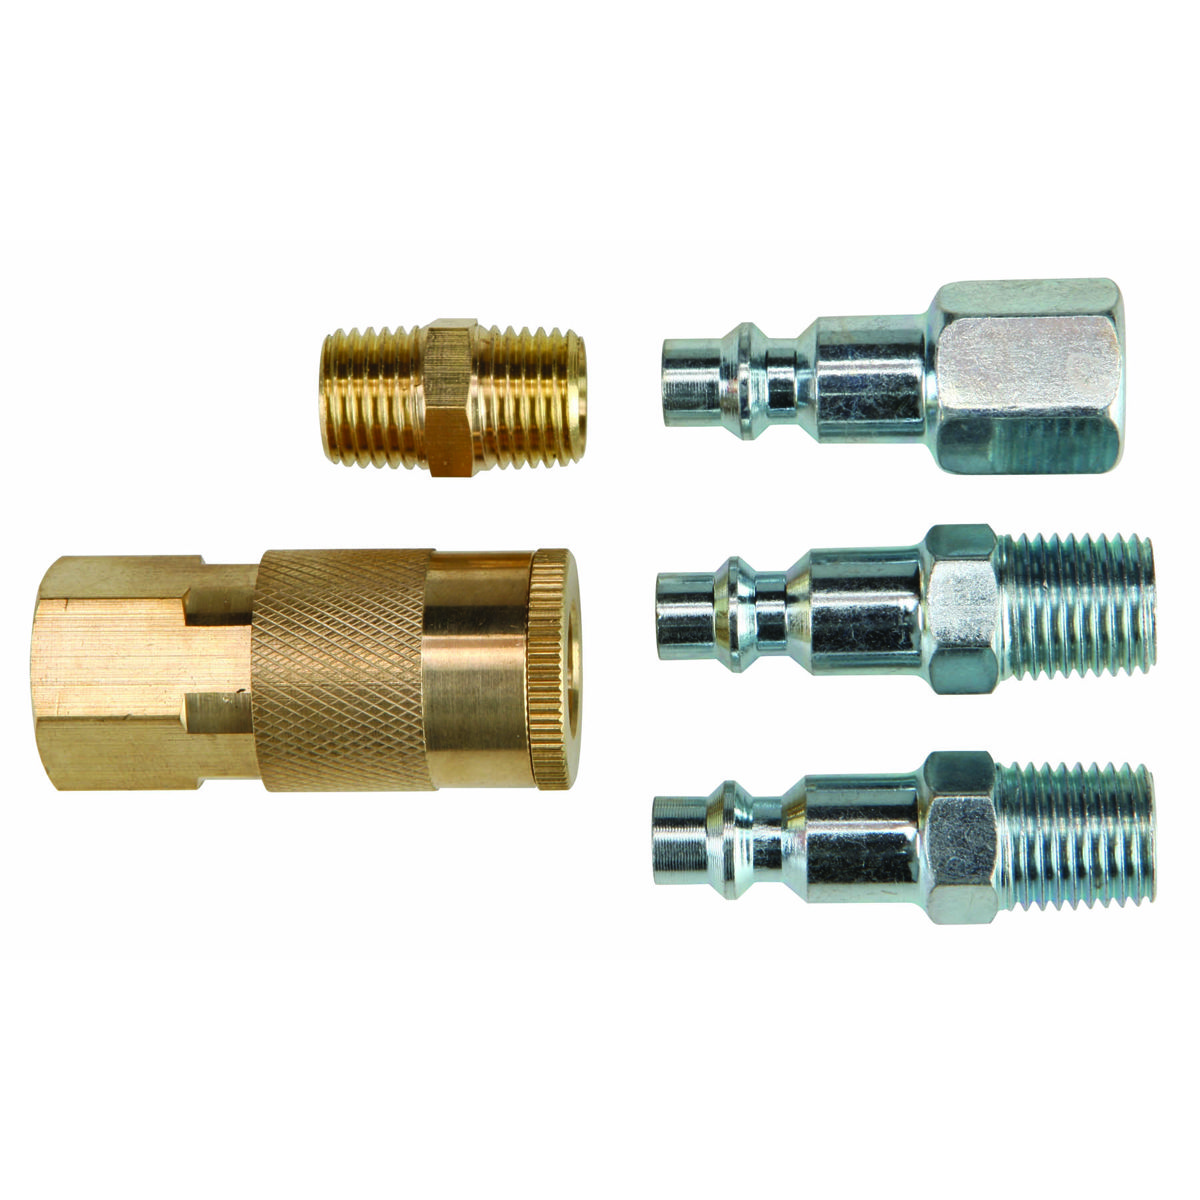 5 Piece Industrial Quick Coupler Compressor Starter Kit